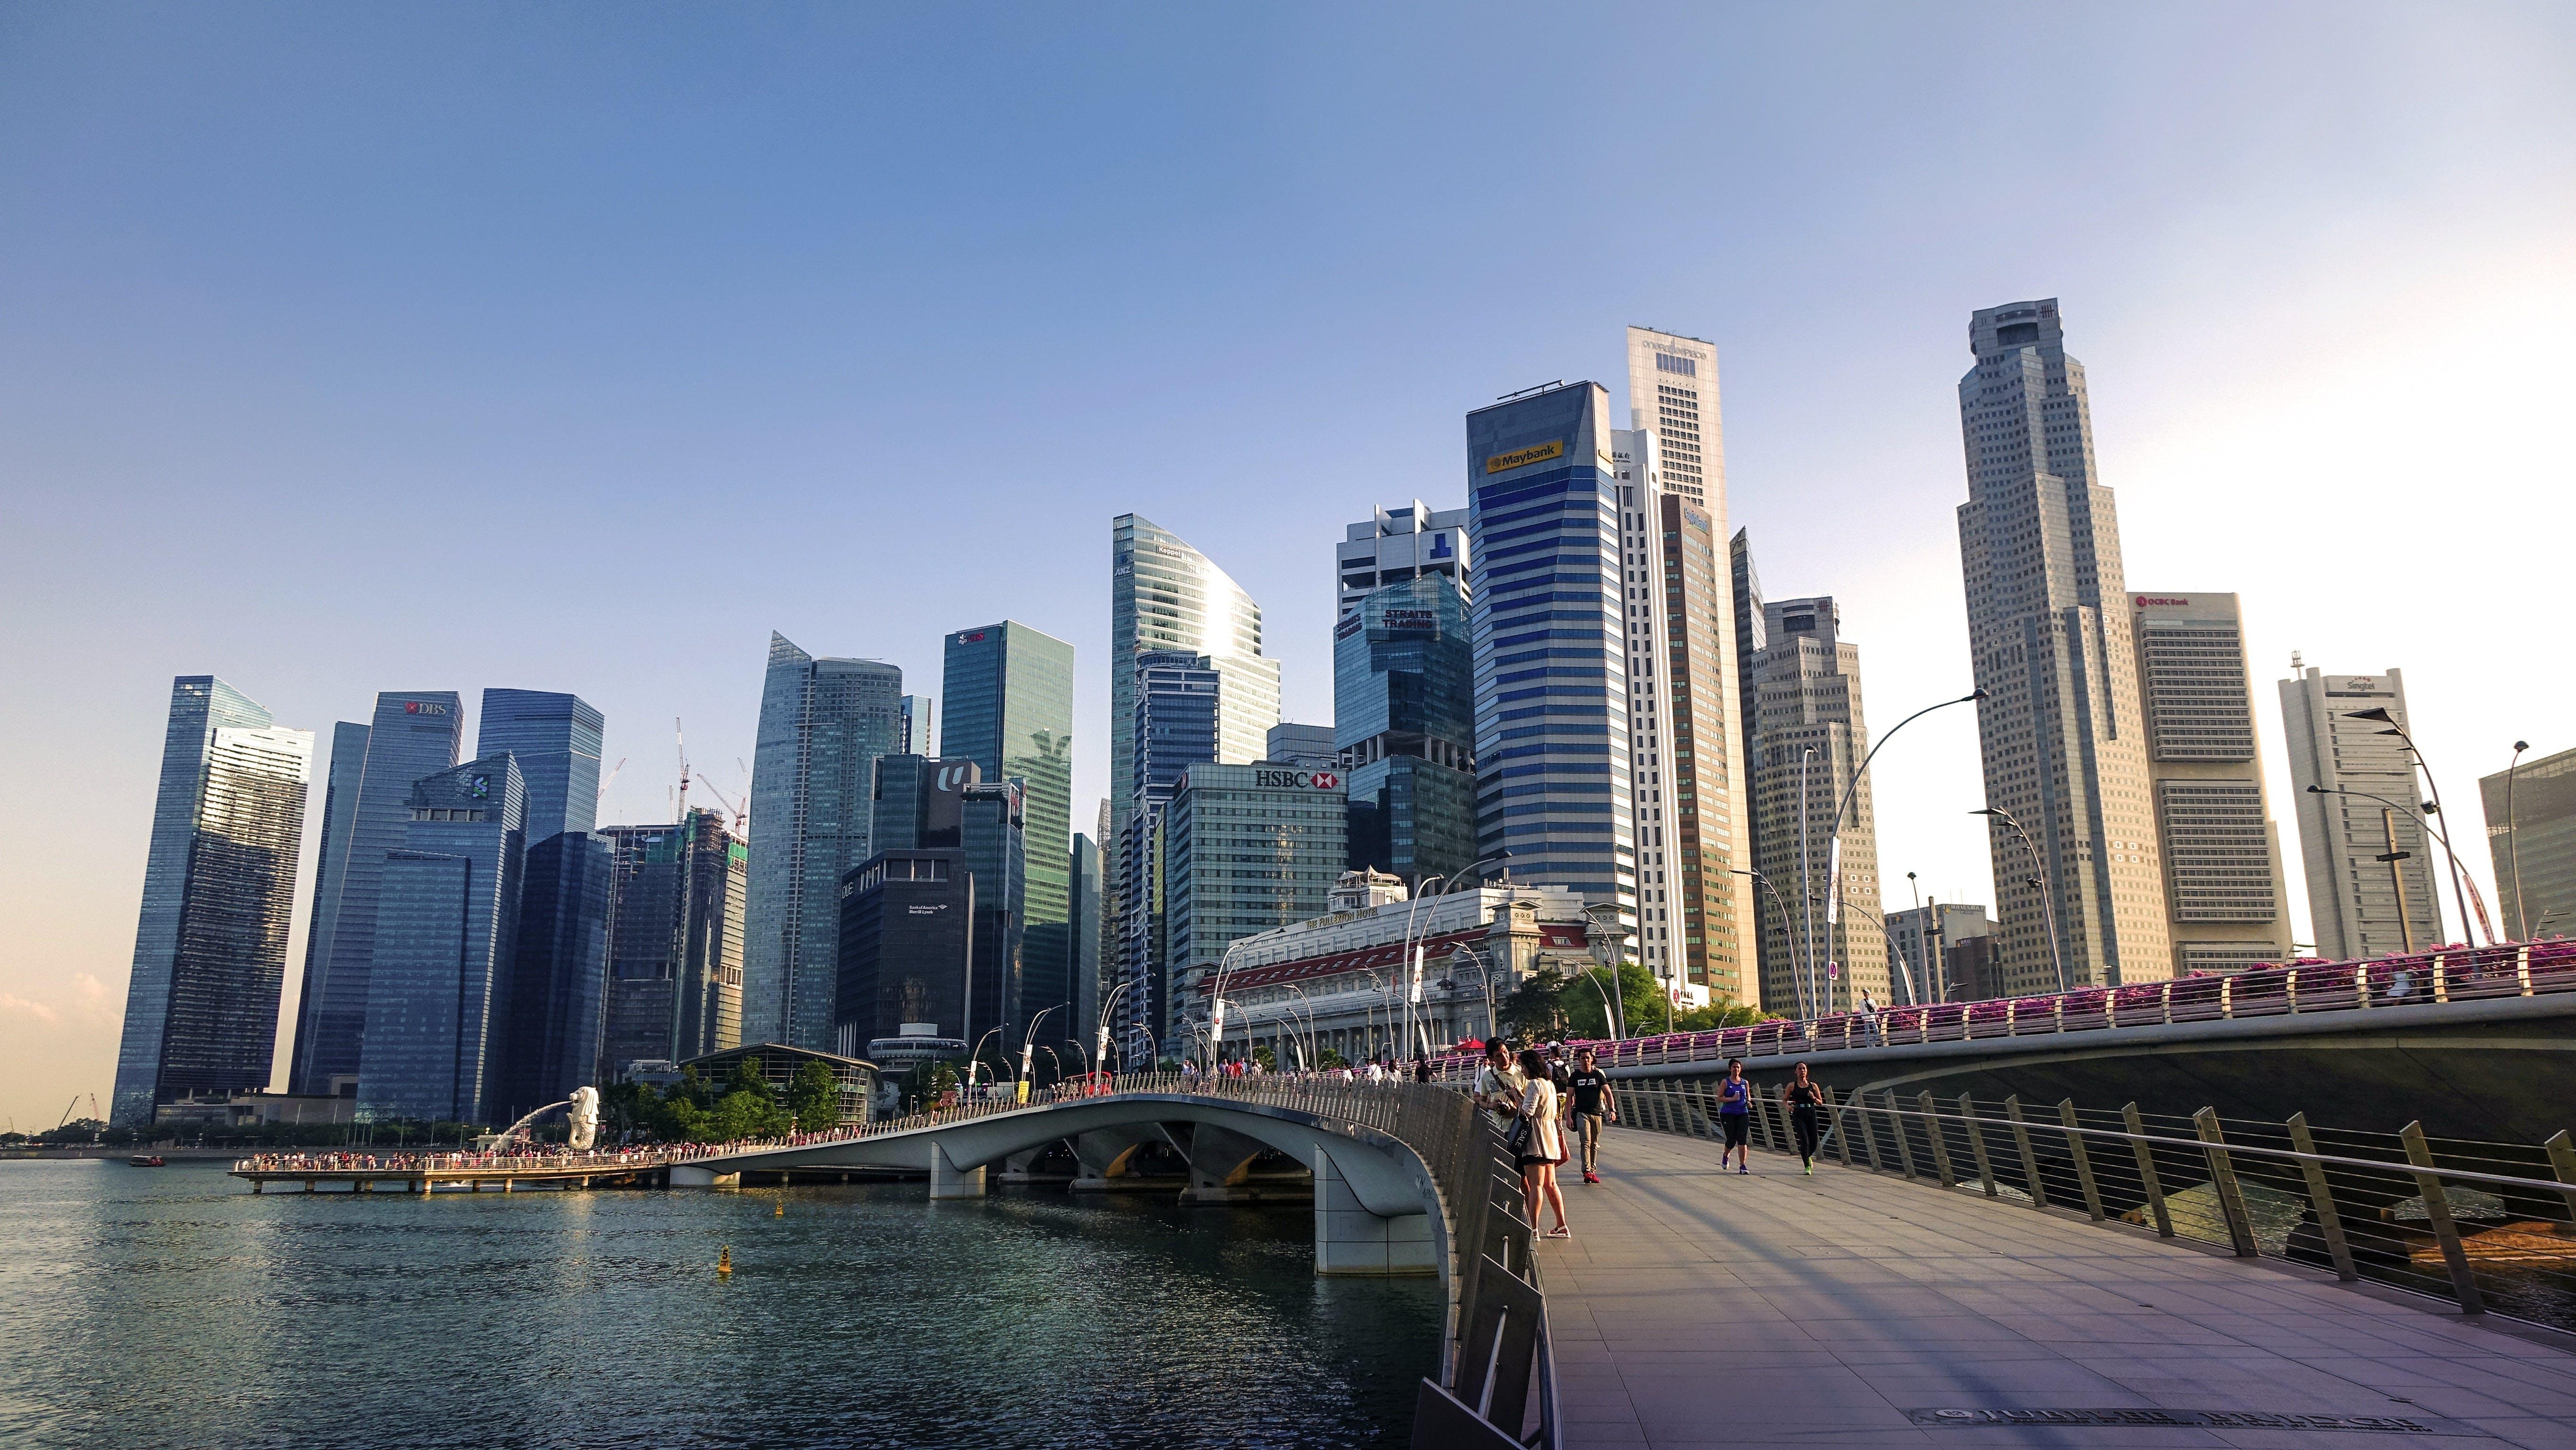 Free stock photo of city, people, water, skyline